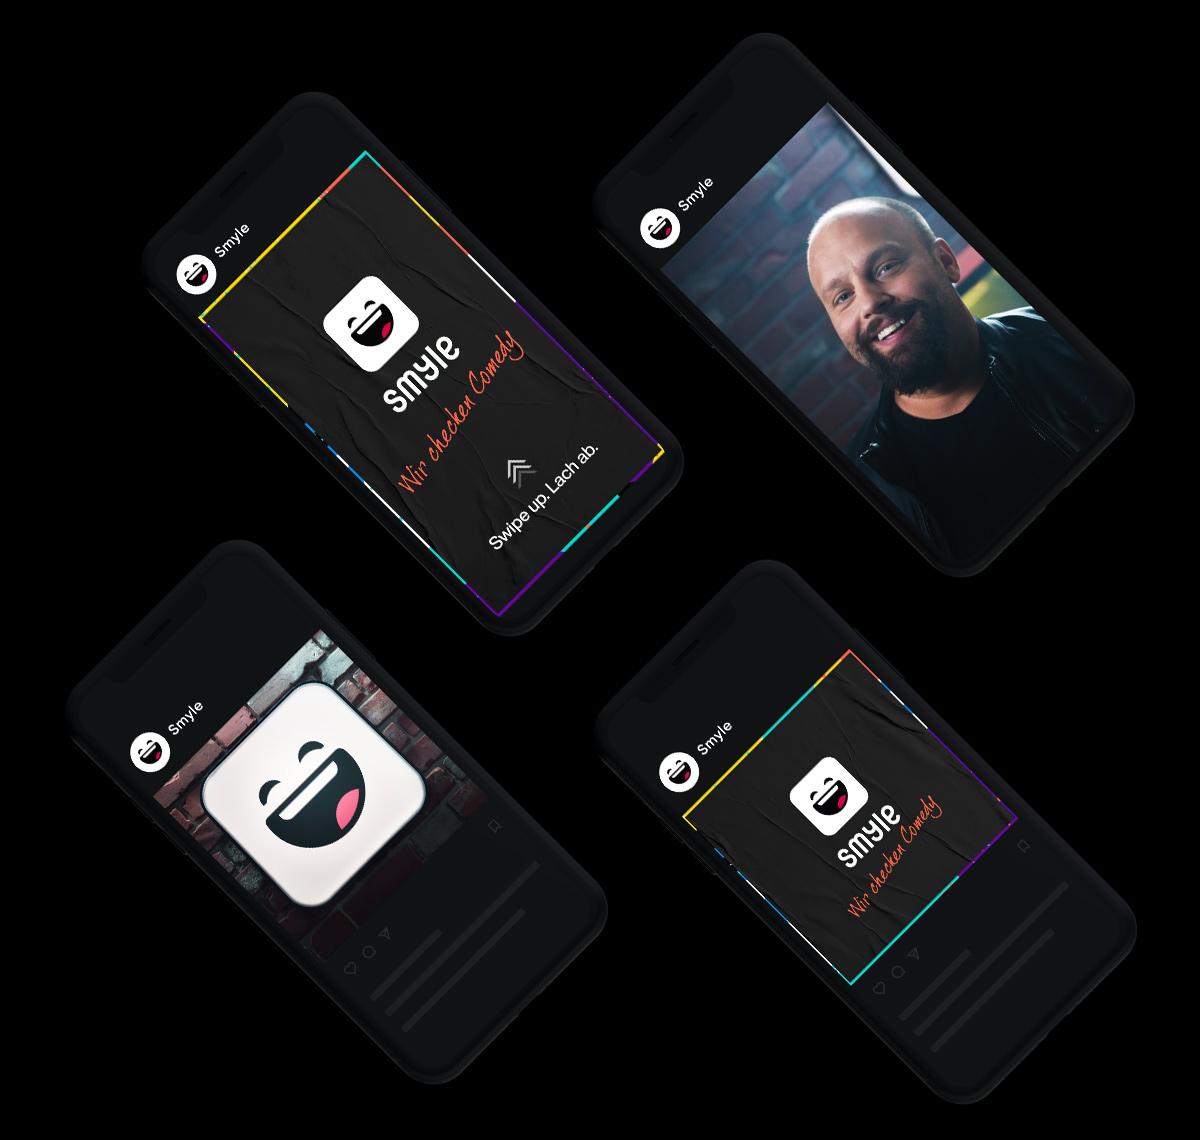 AIM-Studio-Christian-Dueckminor-Smyle-Marken-Design-Social-Media-Packshots